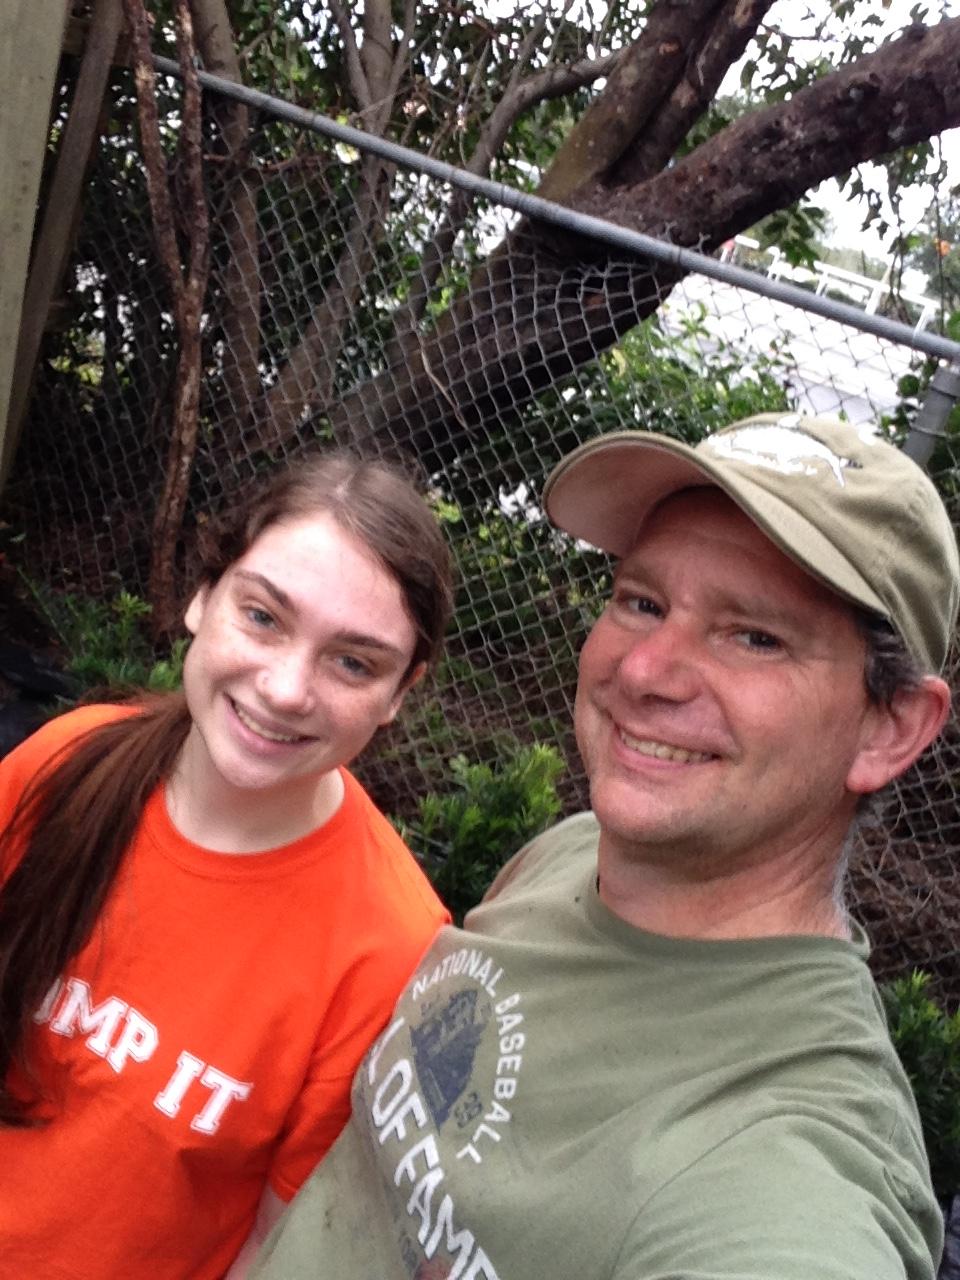 With fellow gardener, Melanie Blanton.